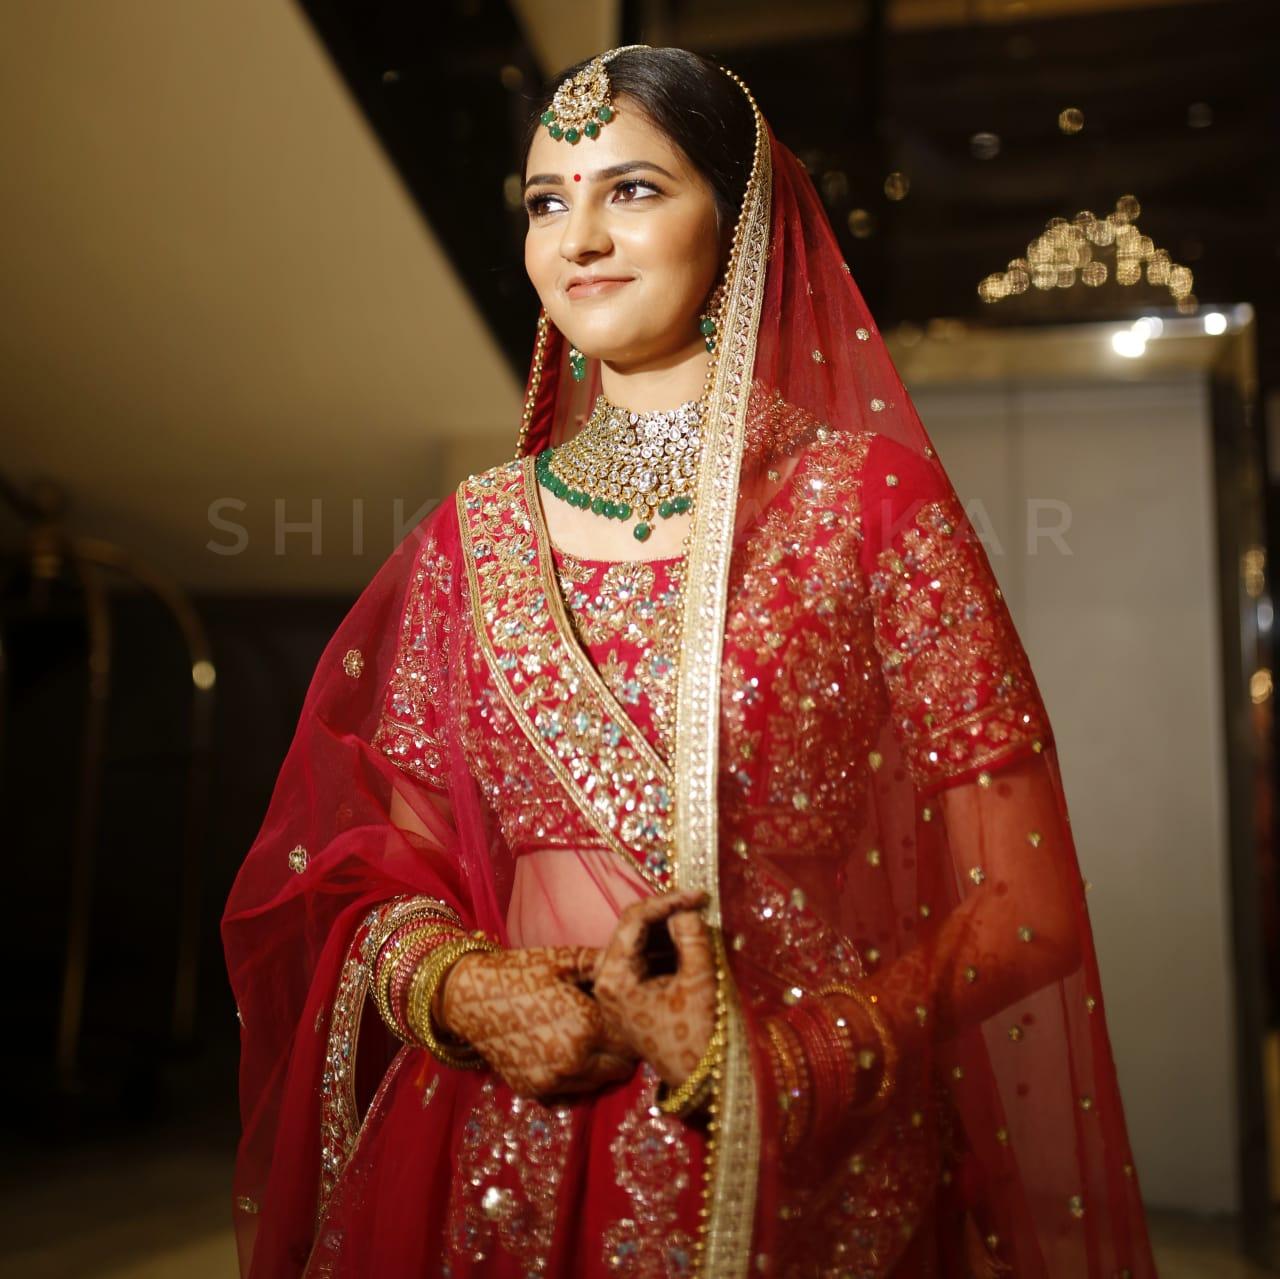 shikha-gajendragadkar-makeup-artist-delhi-ncr